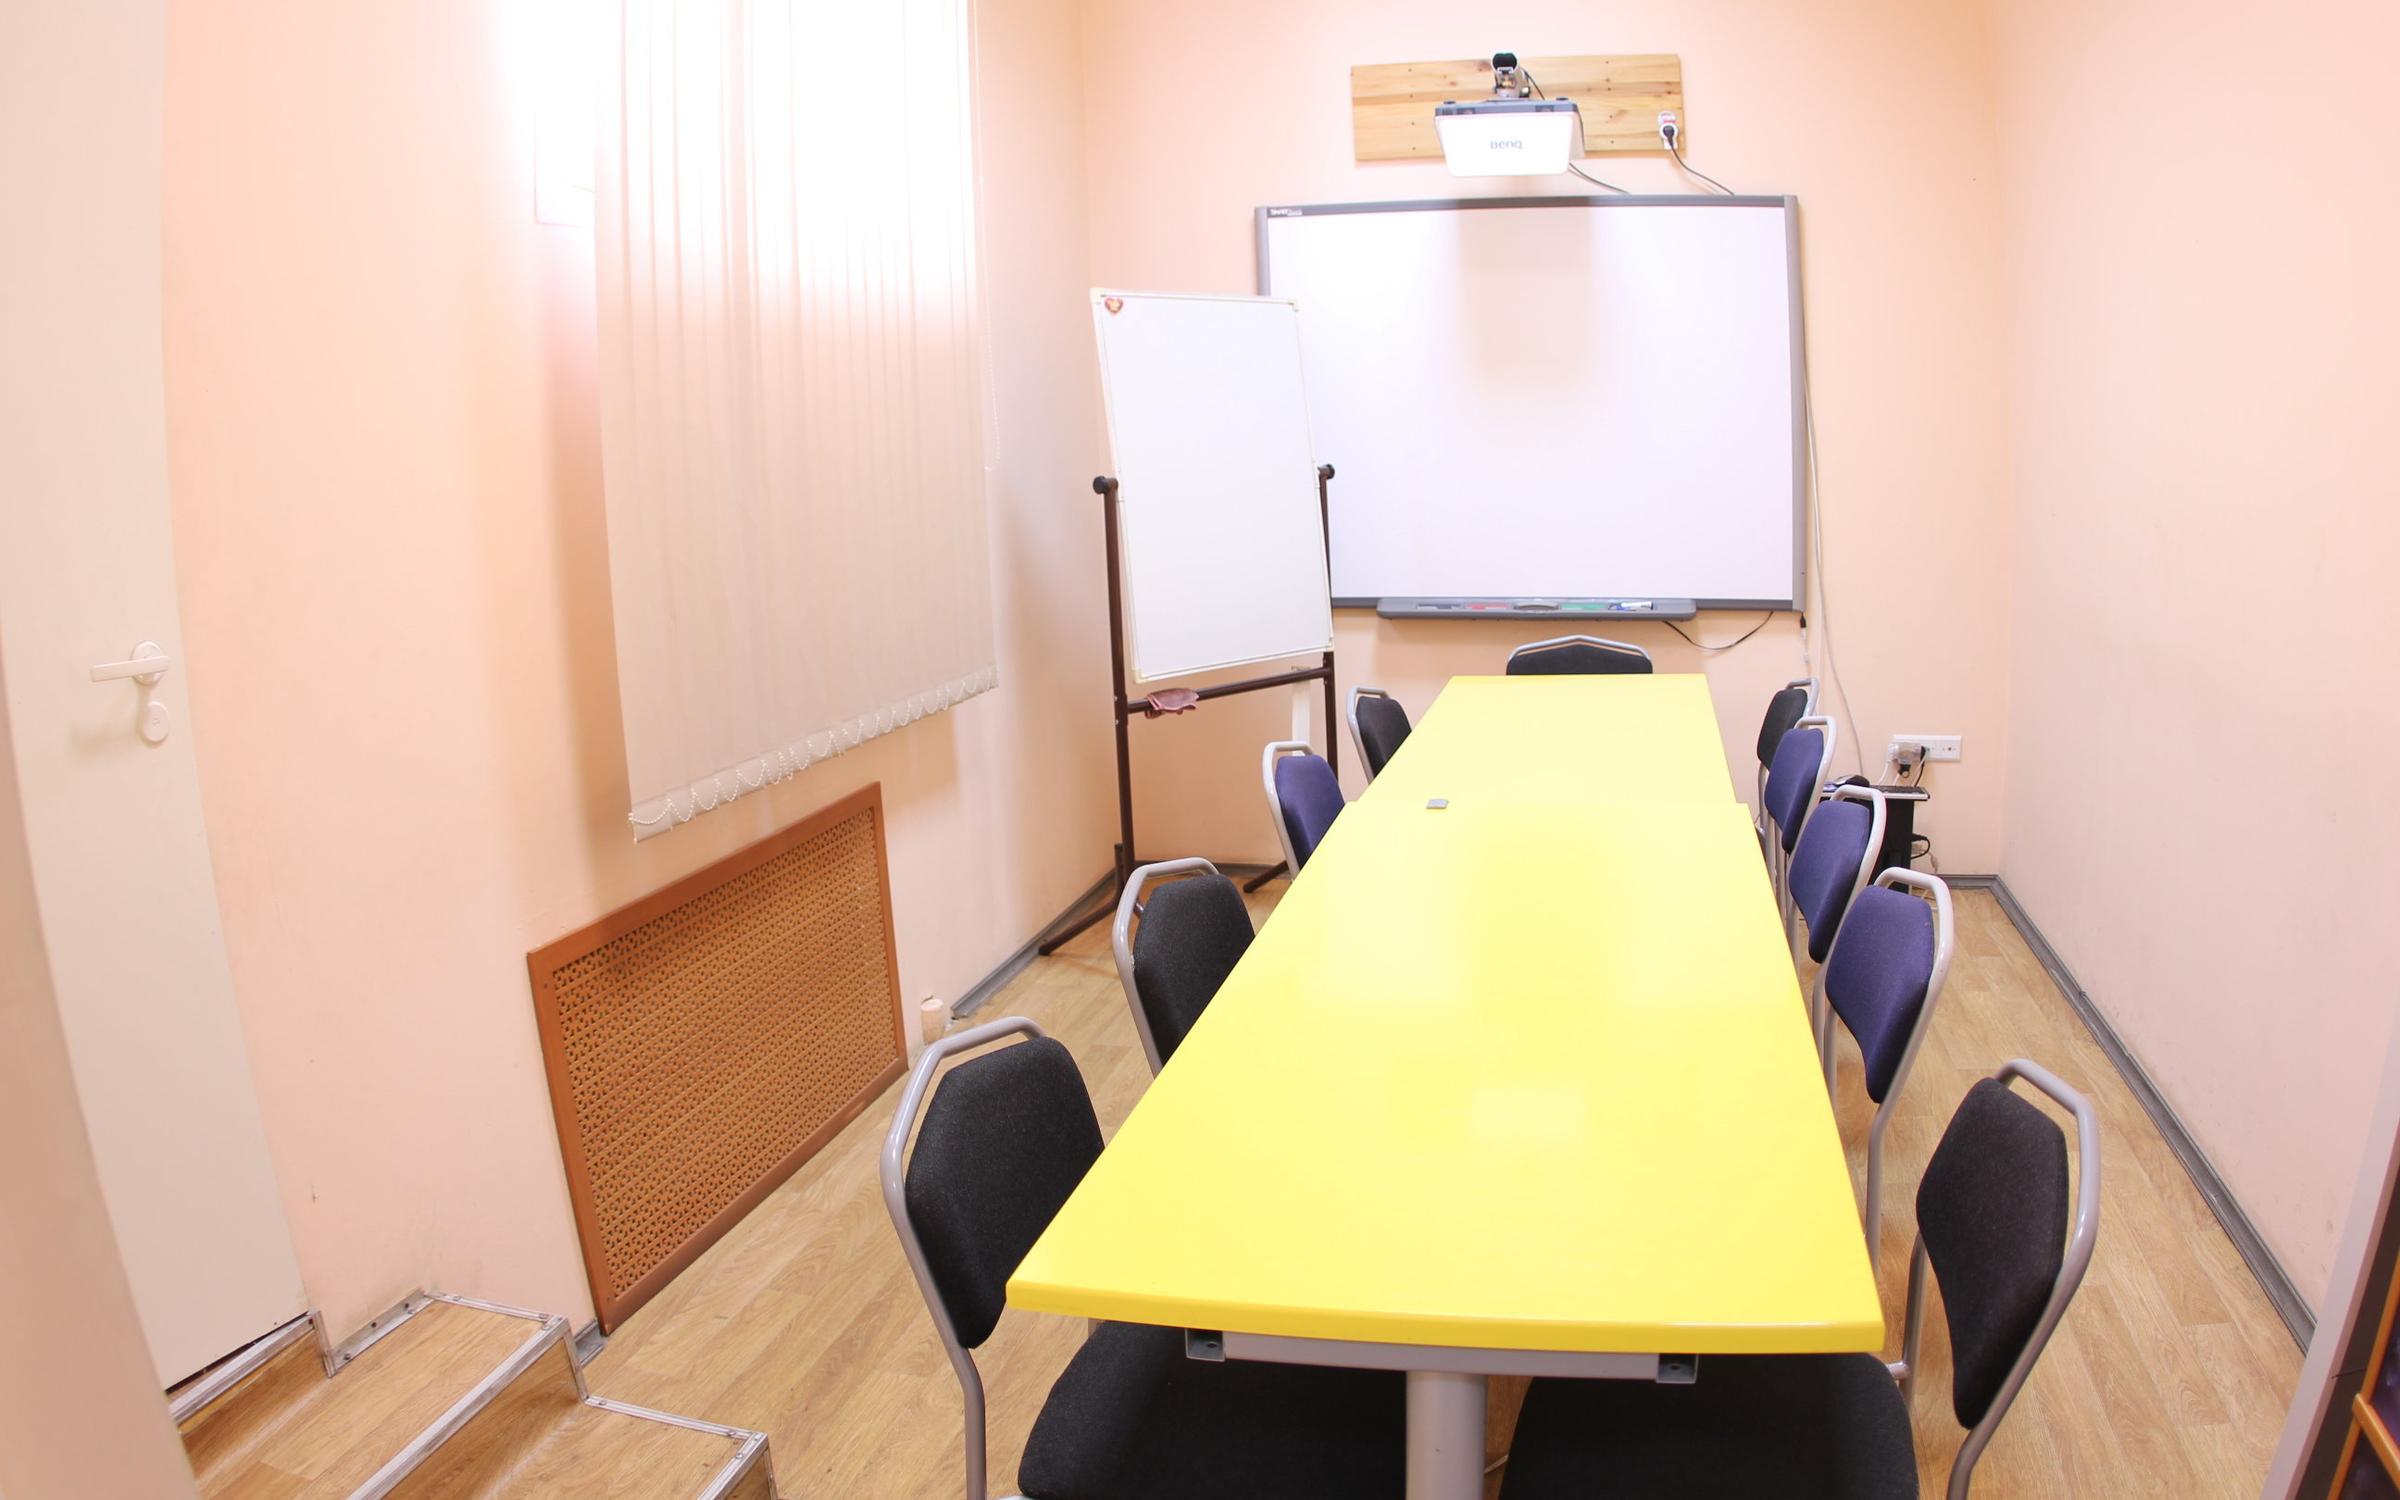 фотография Учебного центра Арсенал-Д на улице Маршала Чуйкова